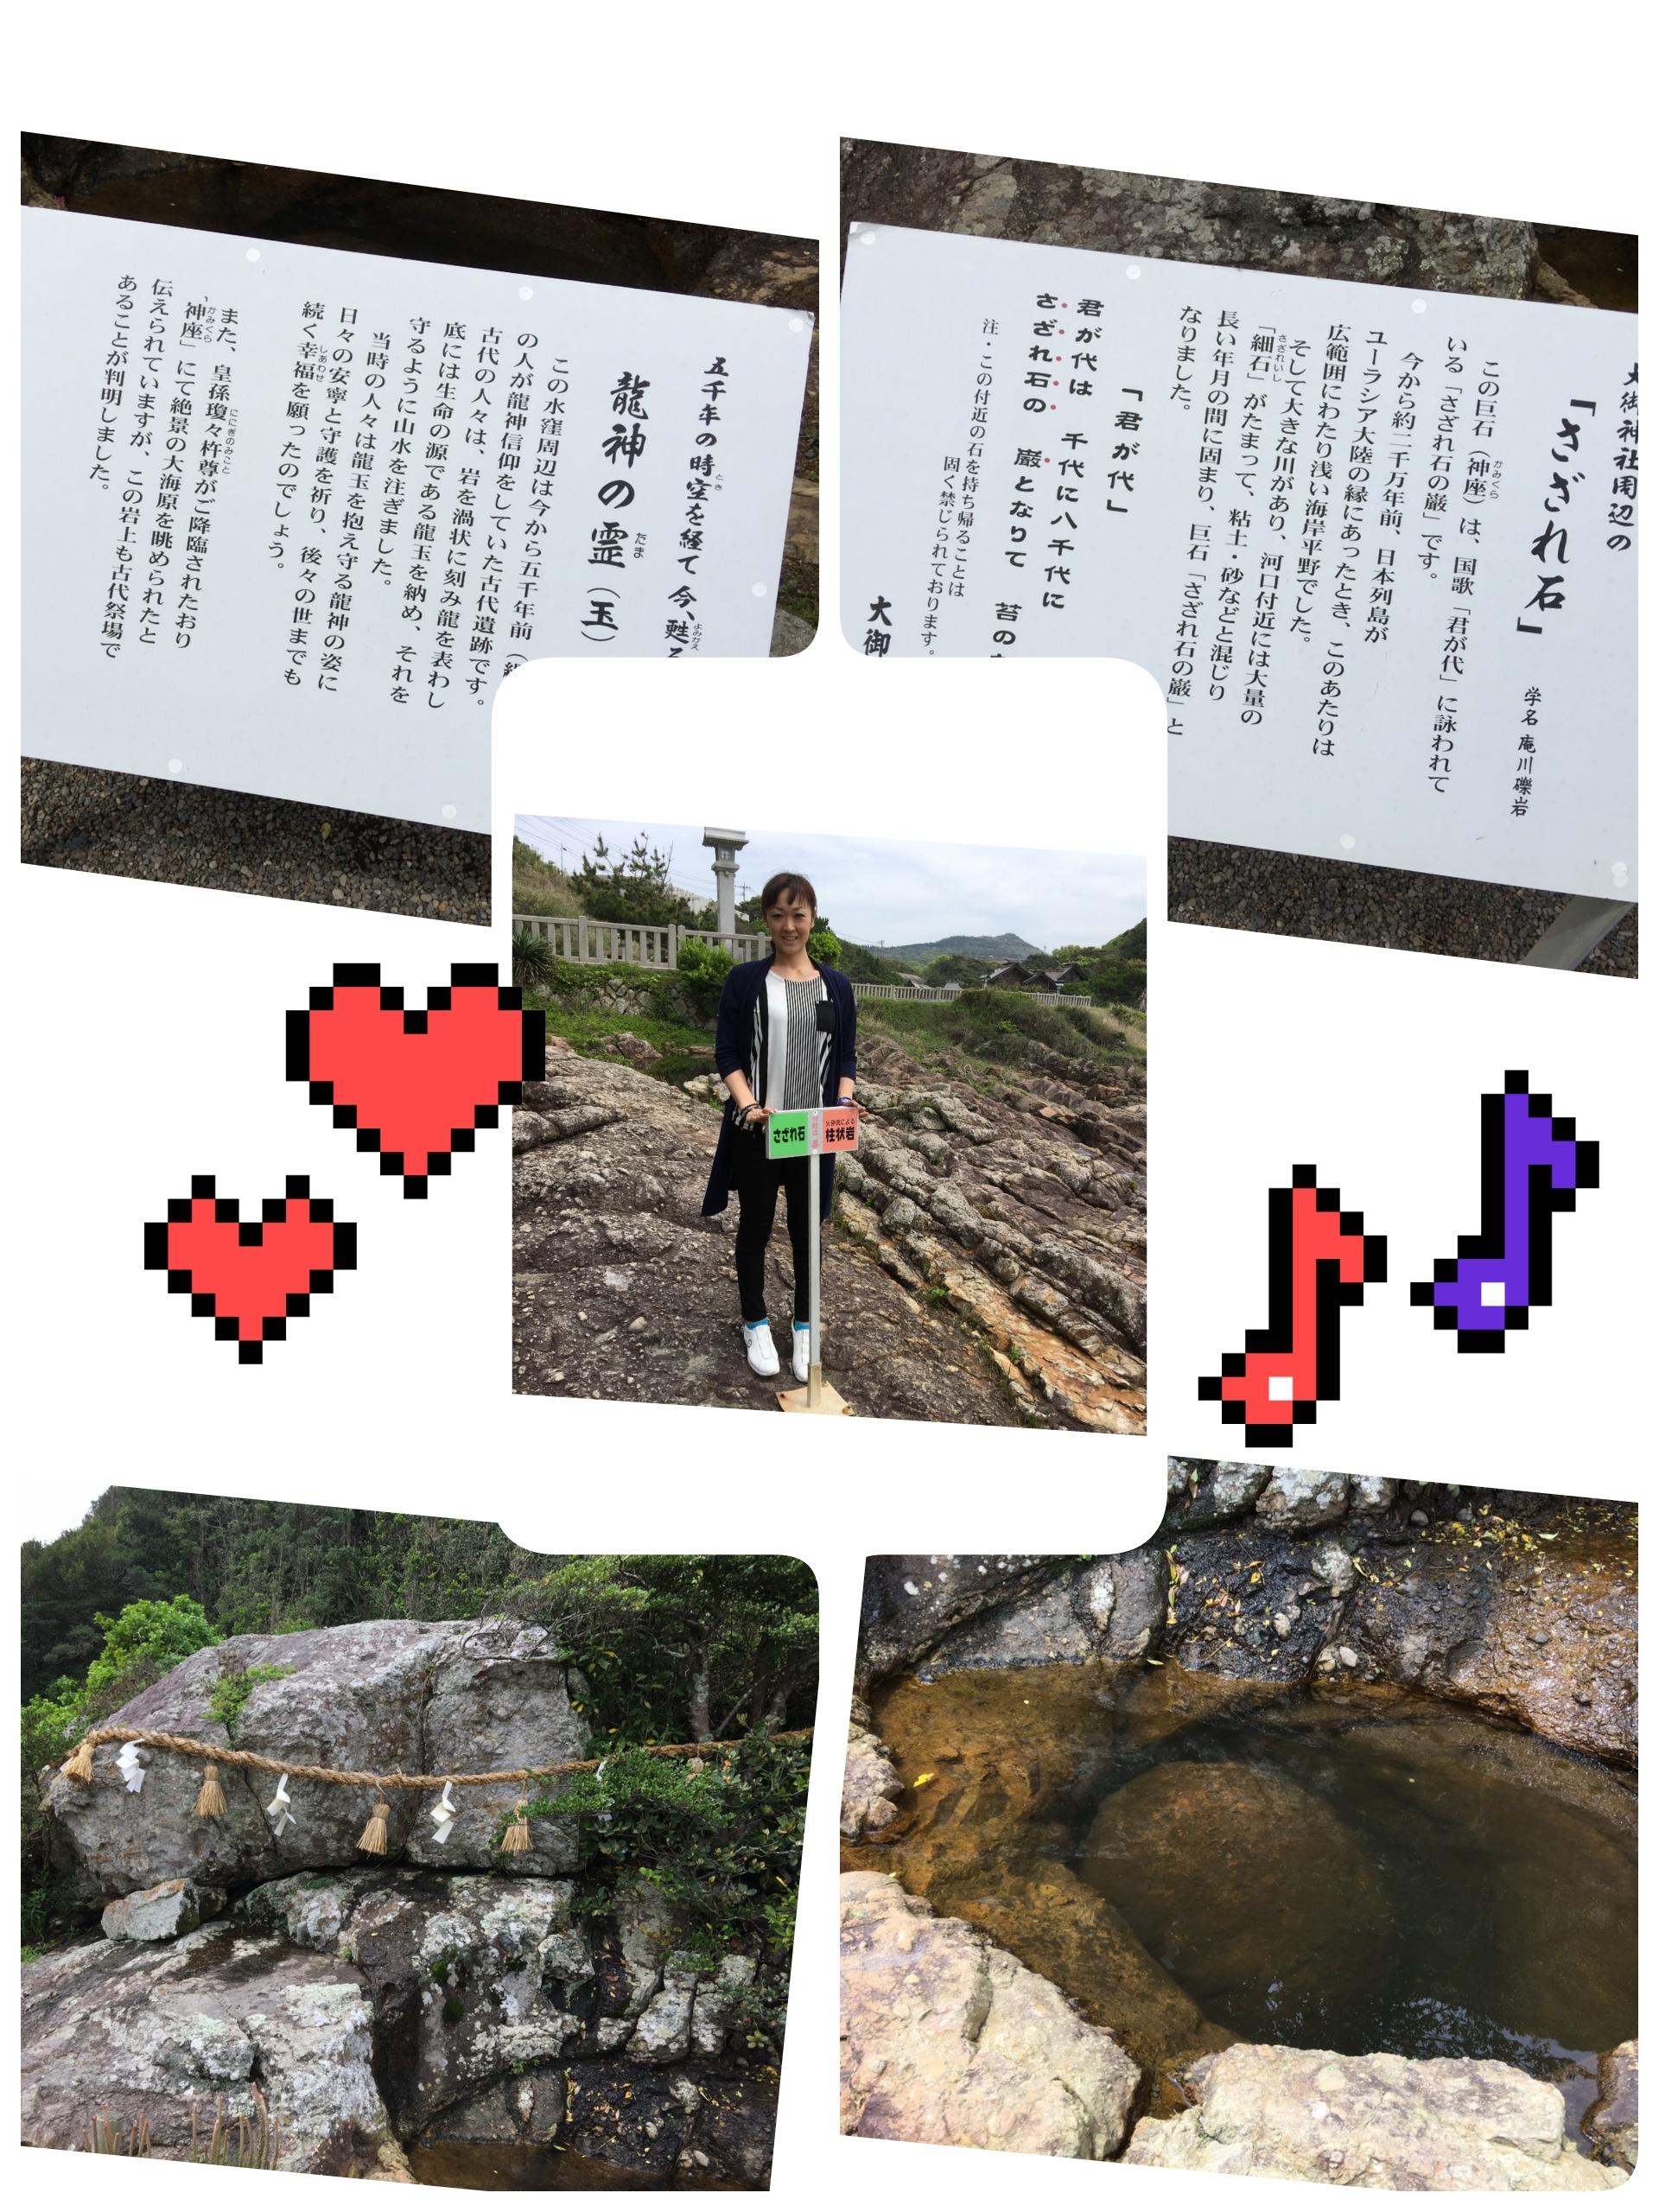 17-04-19-15-03-28-782_deco.jpg